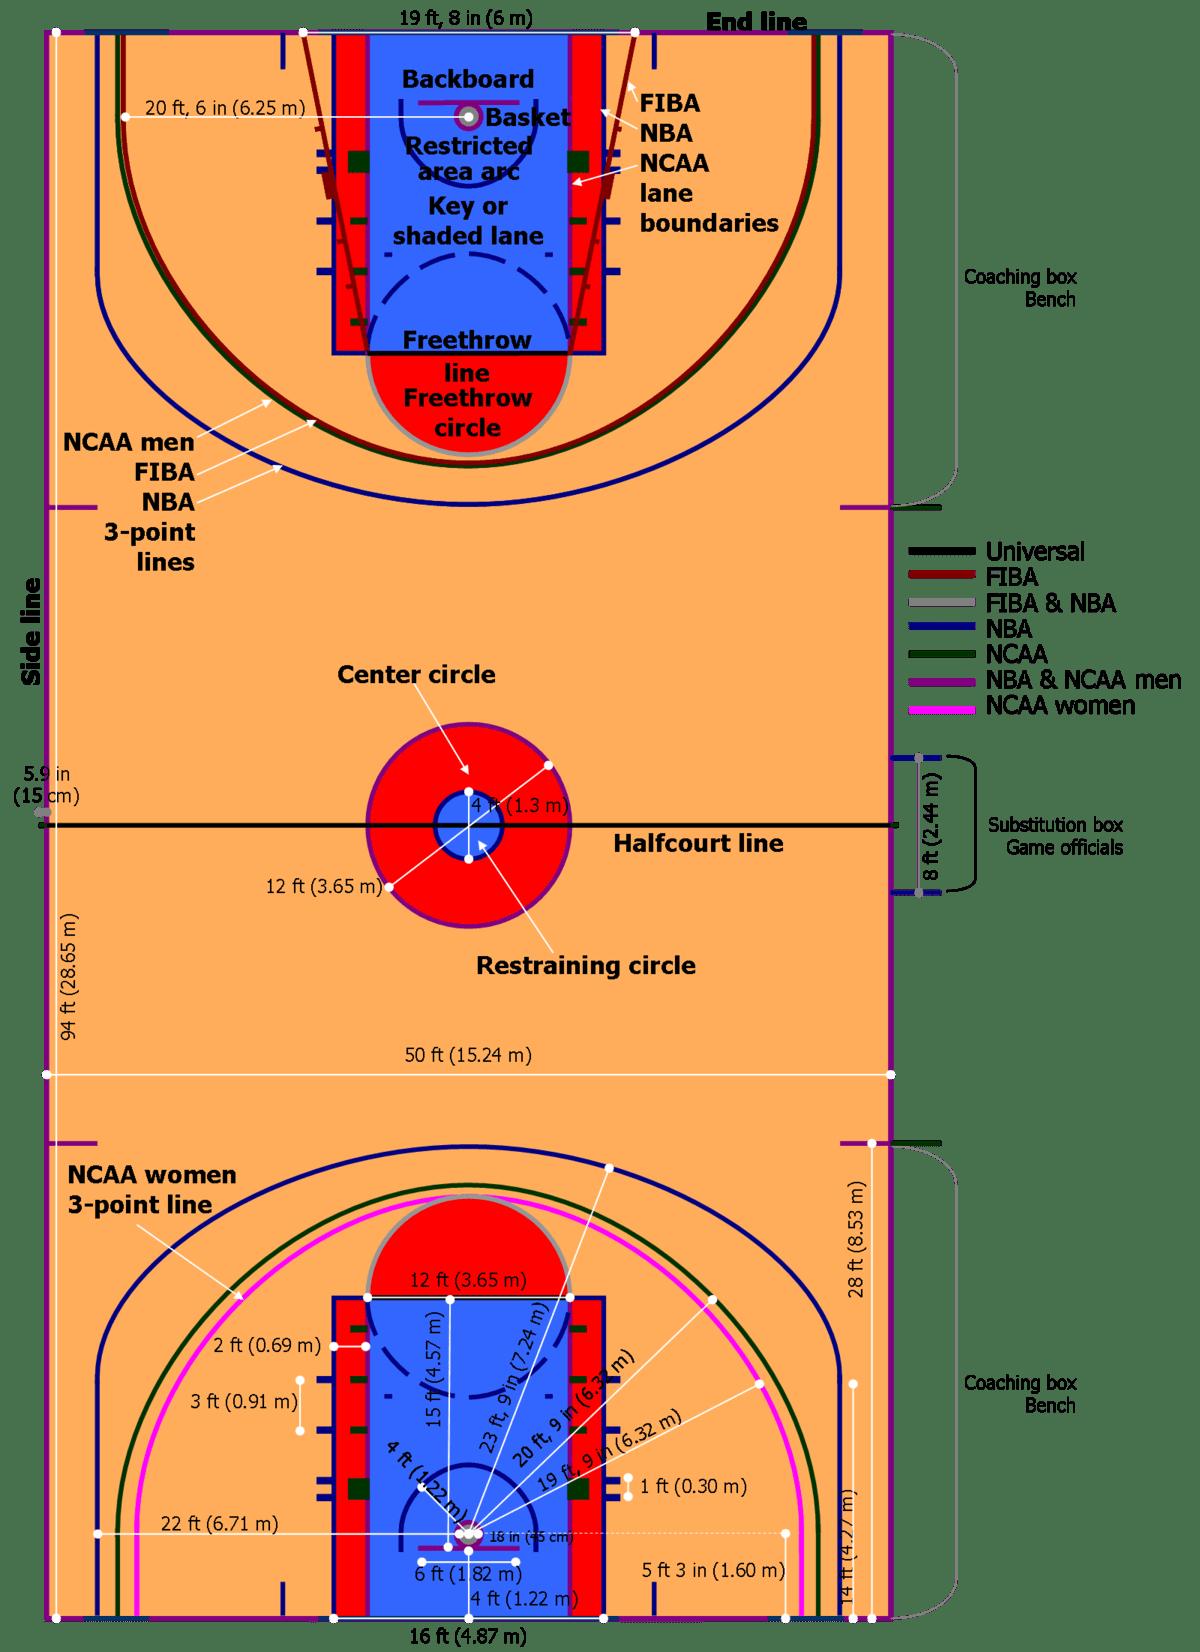 basketball court diagram label 7 pin wiring trailer plug koš poen  Википедија слободна енциклопедија